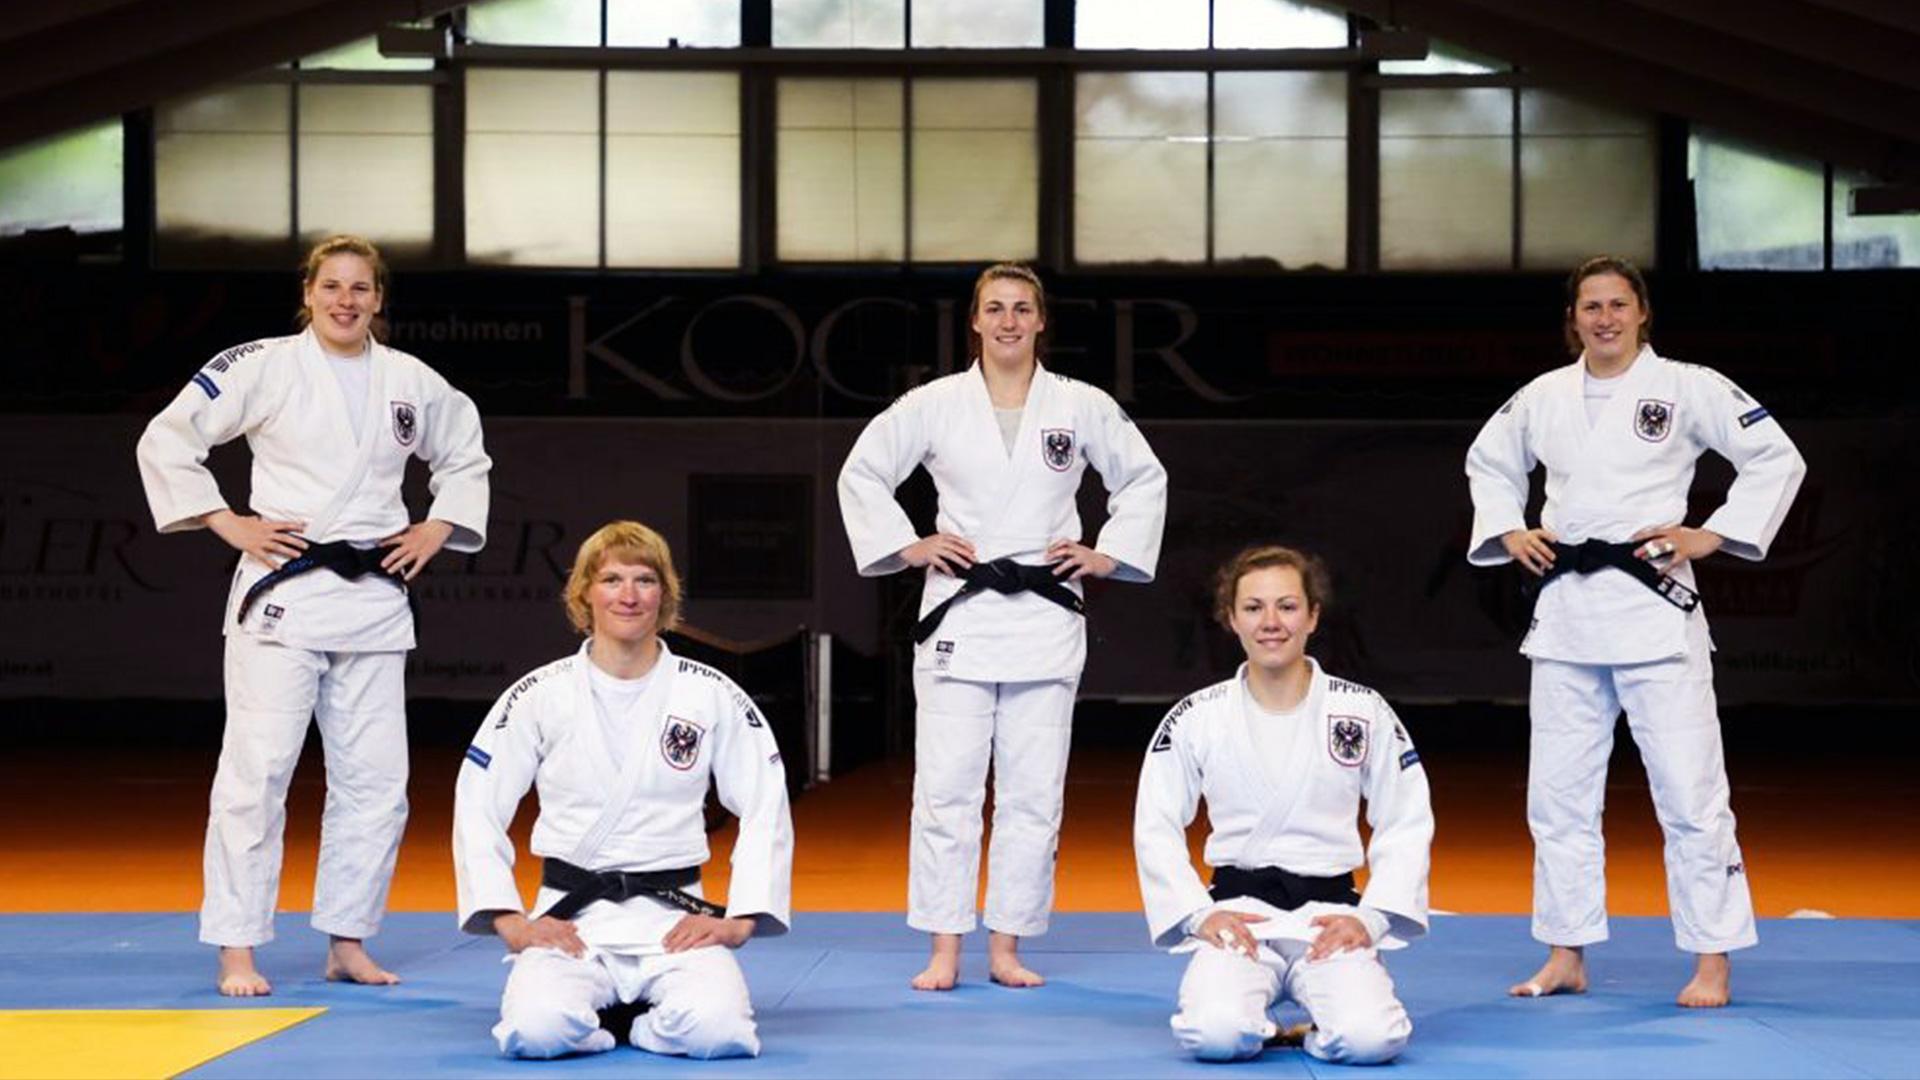 Österreichisches Judo Nationalteam, Trainingslager Mittersill, Top Athleten, Sabrina Filzmoser, Stephan Hegyi